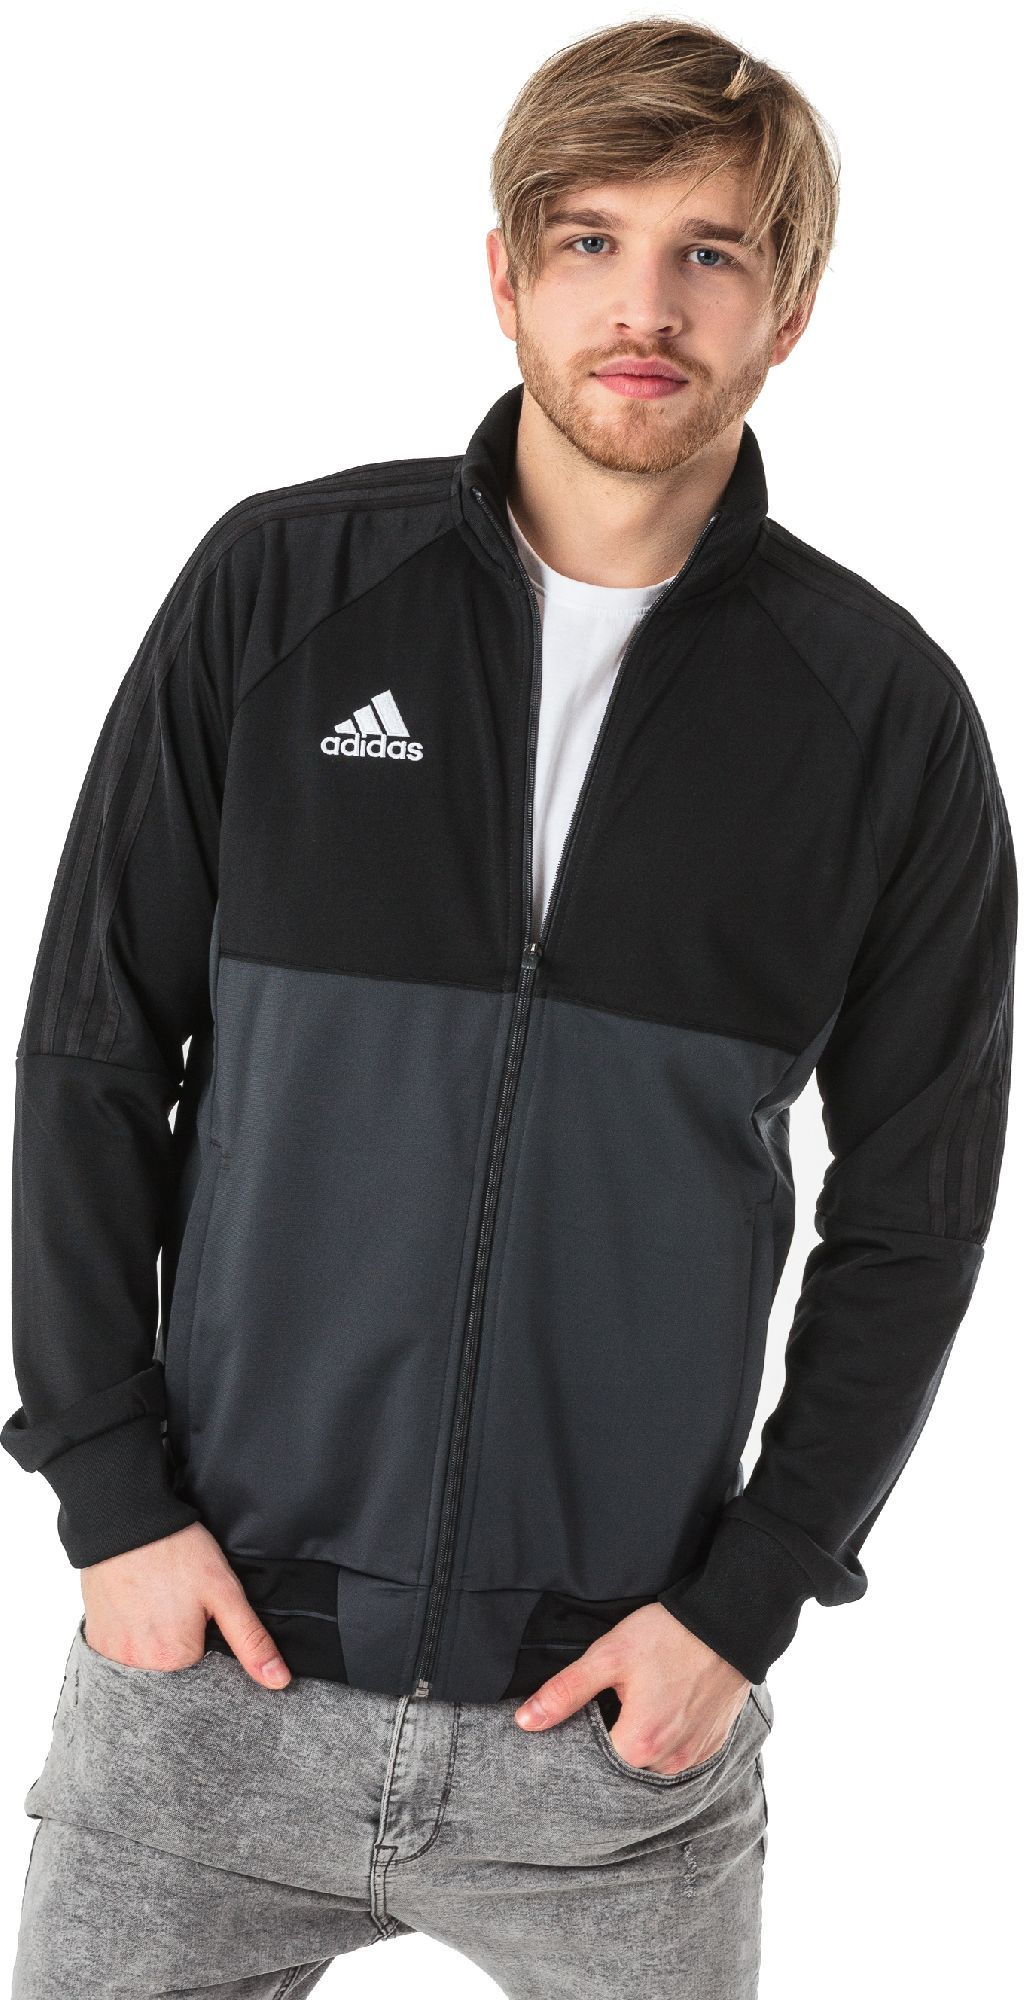 Adidas Bluza piłkarska Tiro 17 czarno szara r. XL (AY2875) ID produktu: 1372706